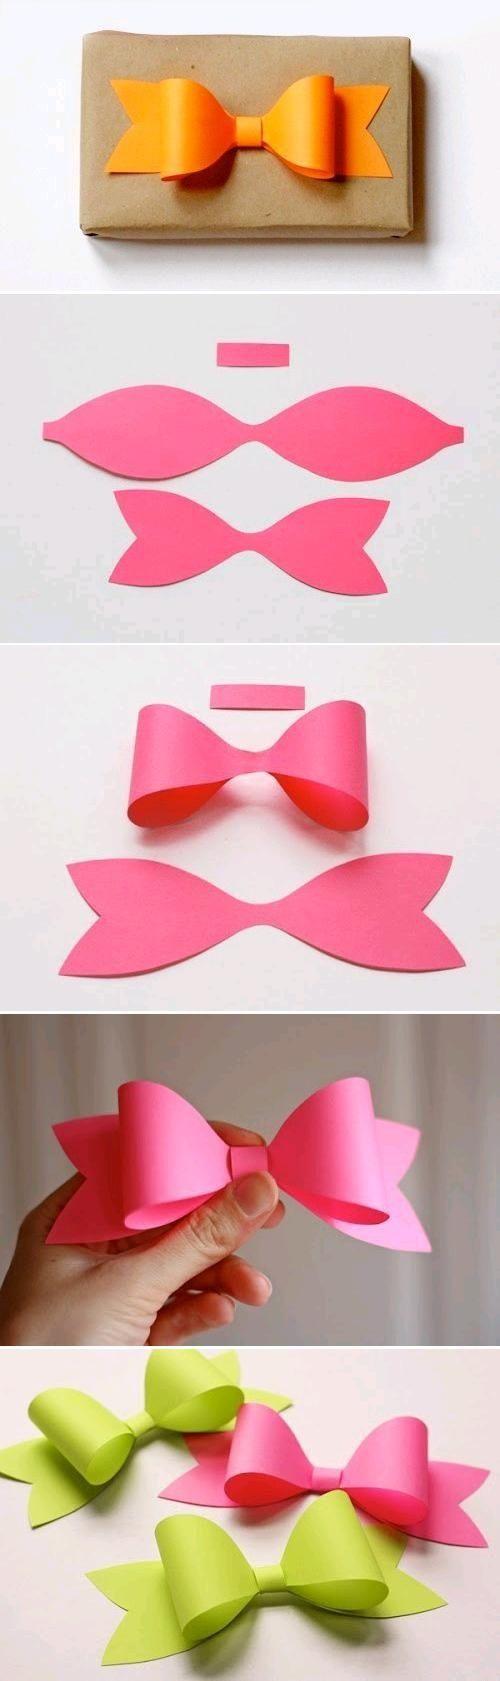 ADORONA:Paper bow